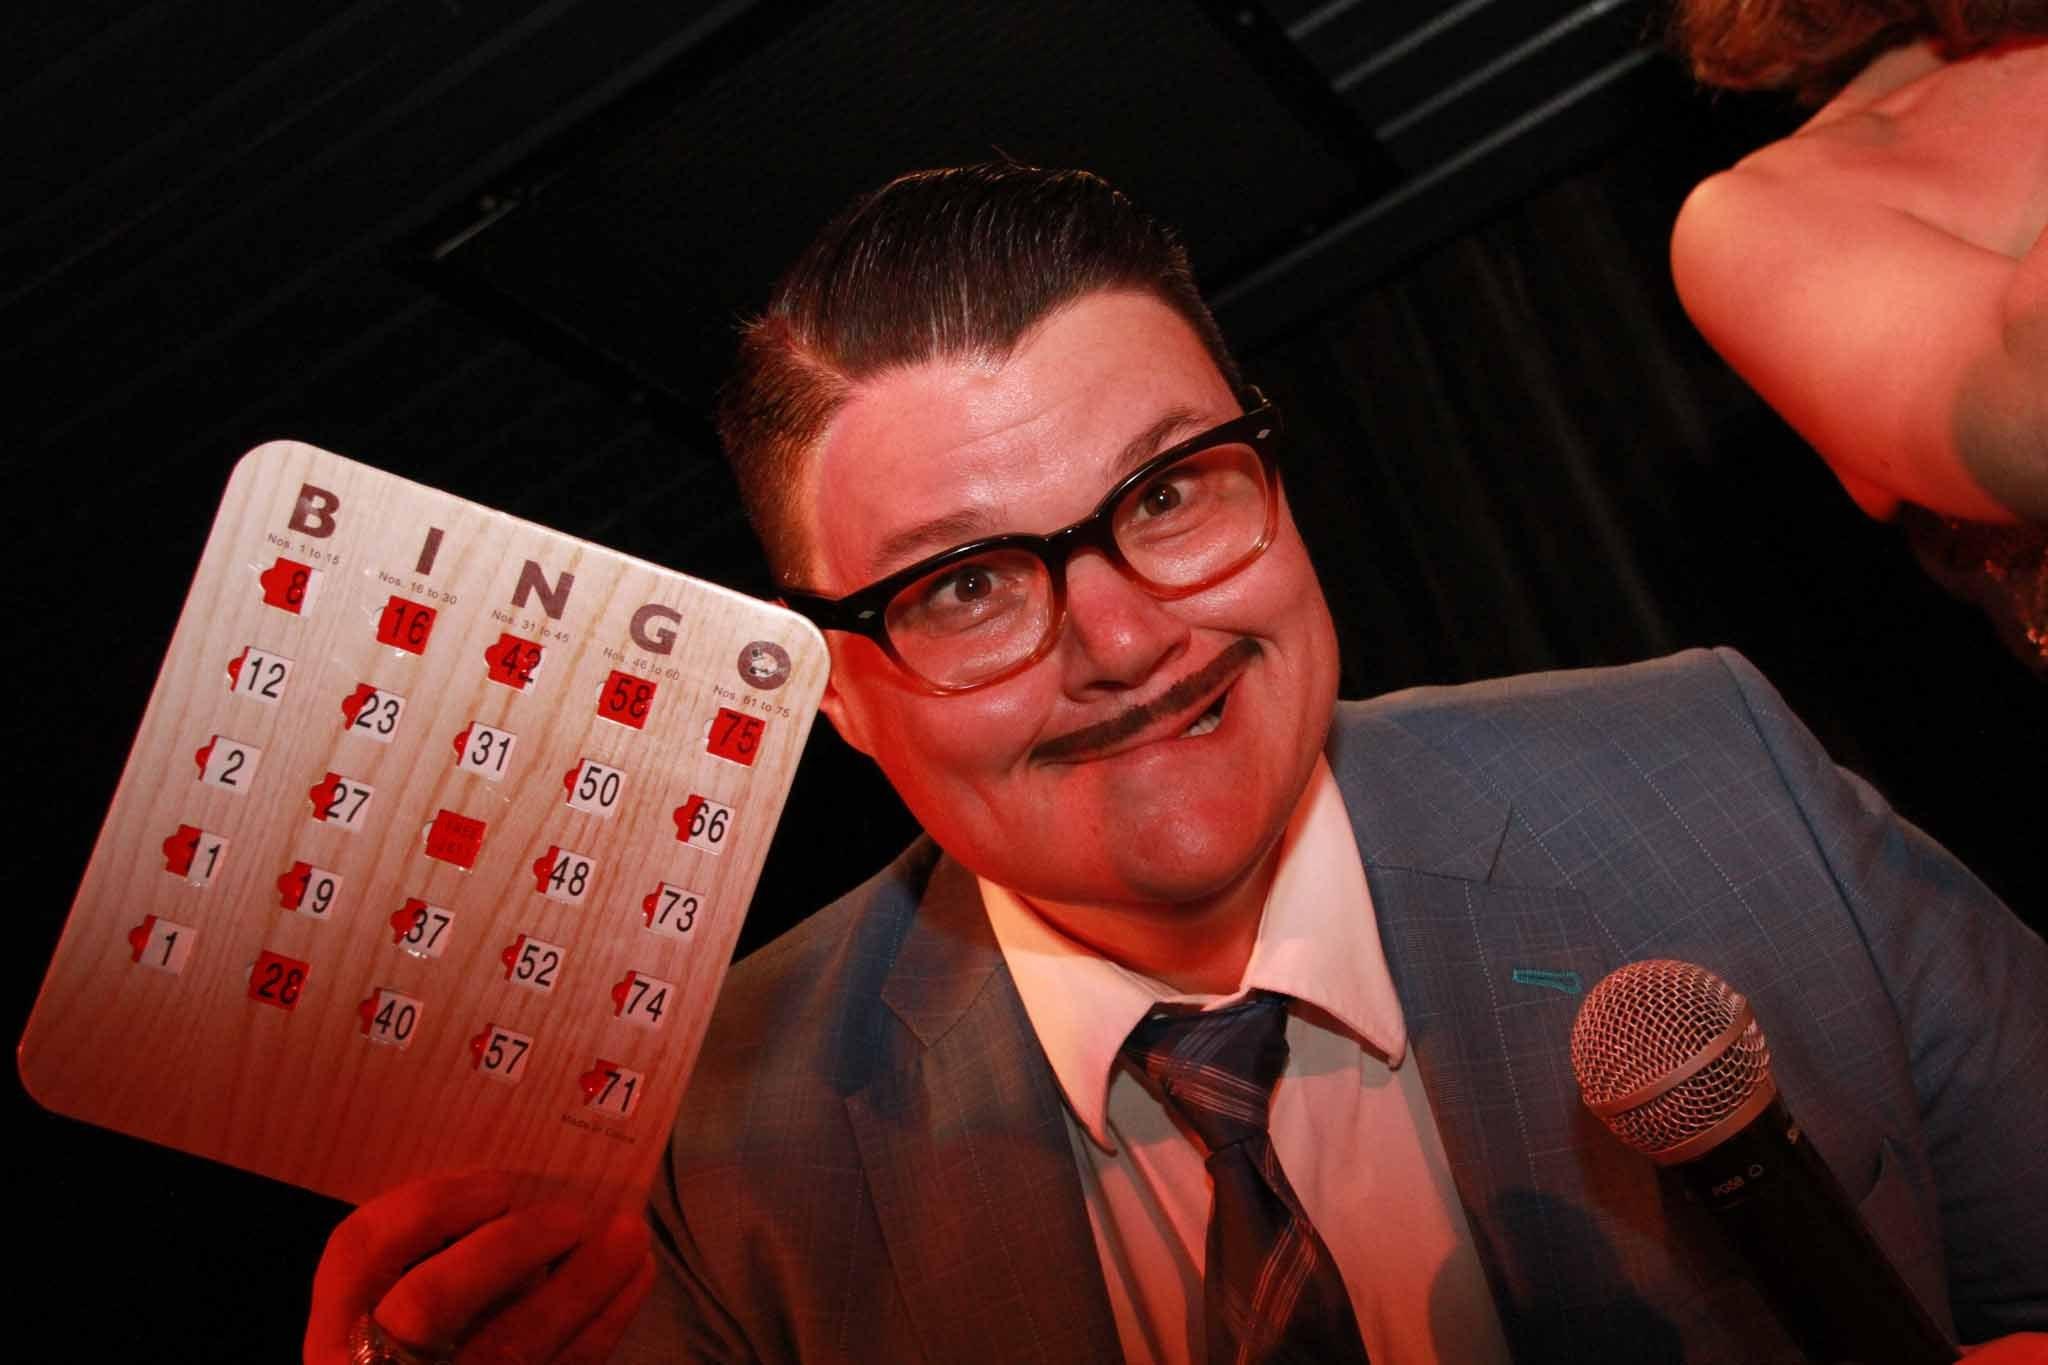 Play bingo at XL…